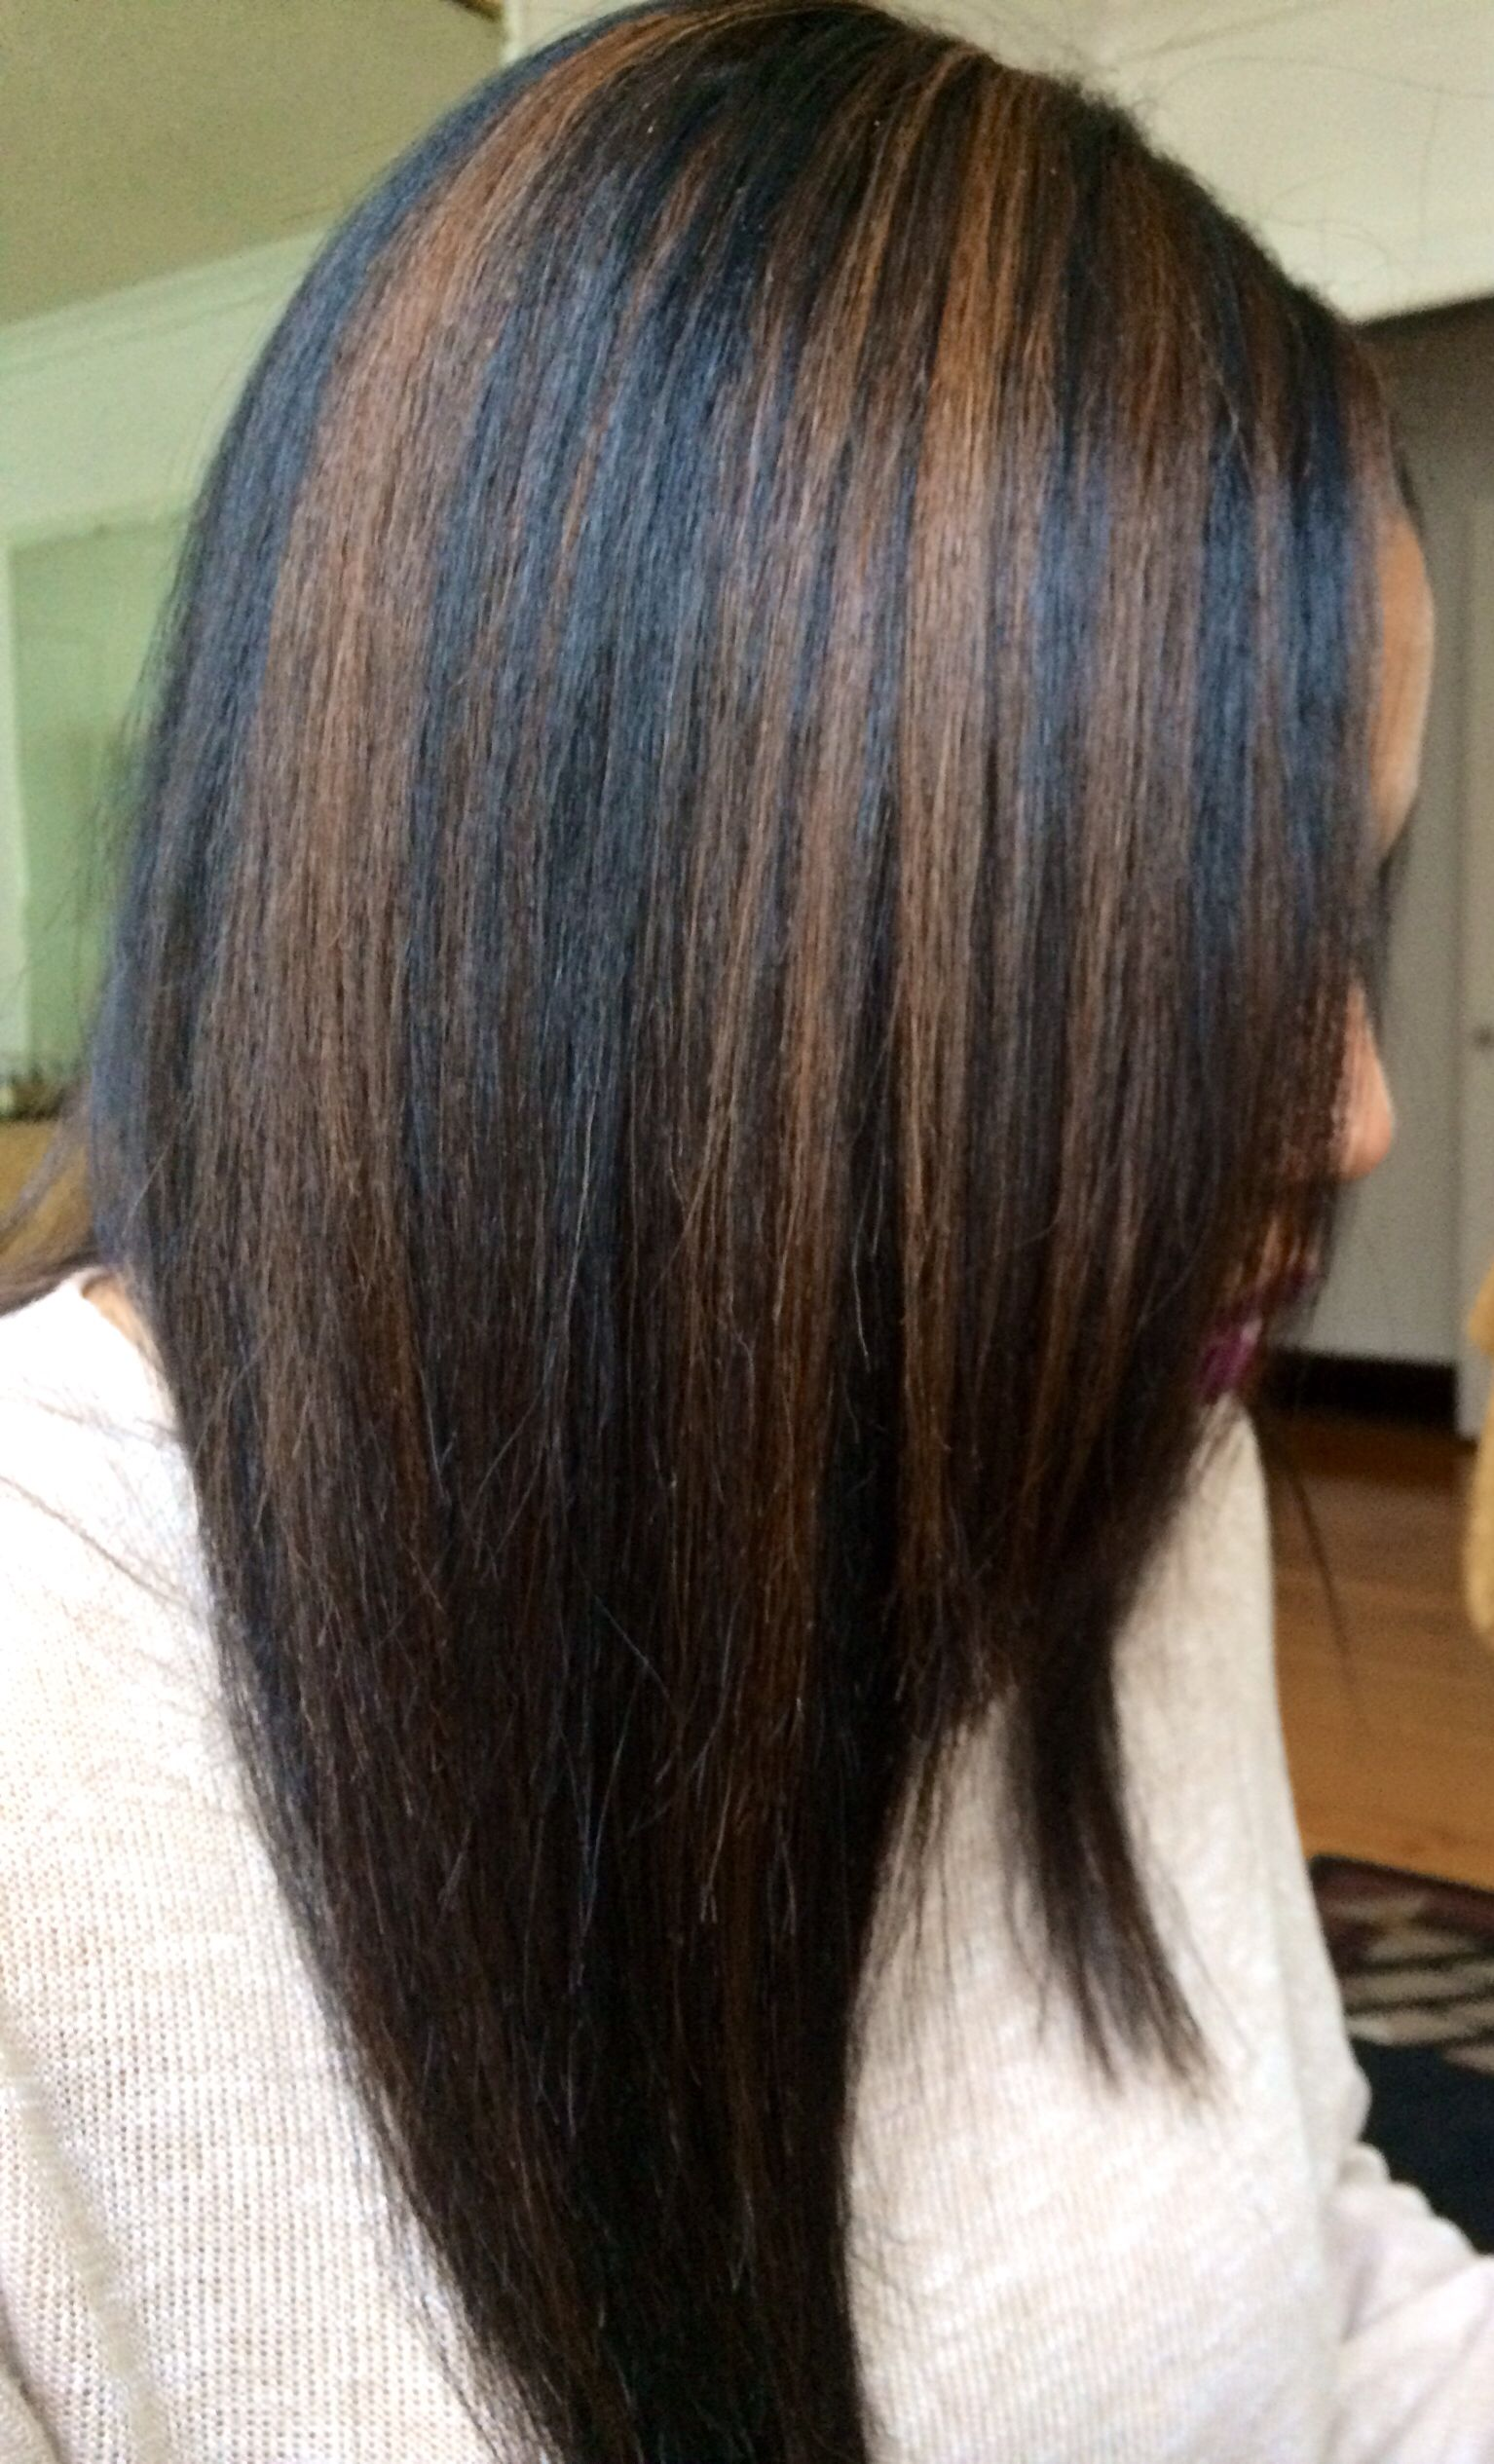 Black Hair With Caramel Highlights Black Hair With Highlights Hair Styles Hair Color Highlights